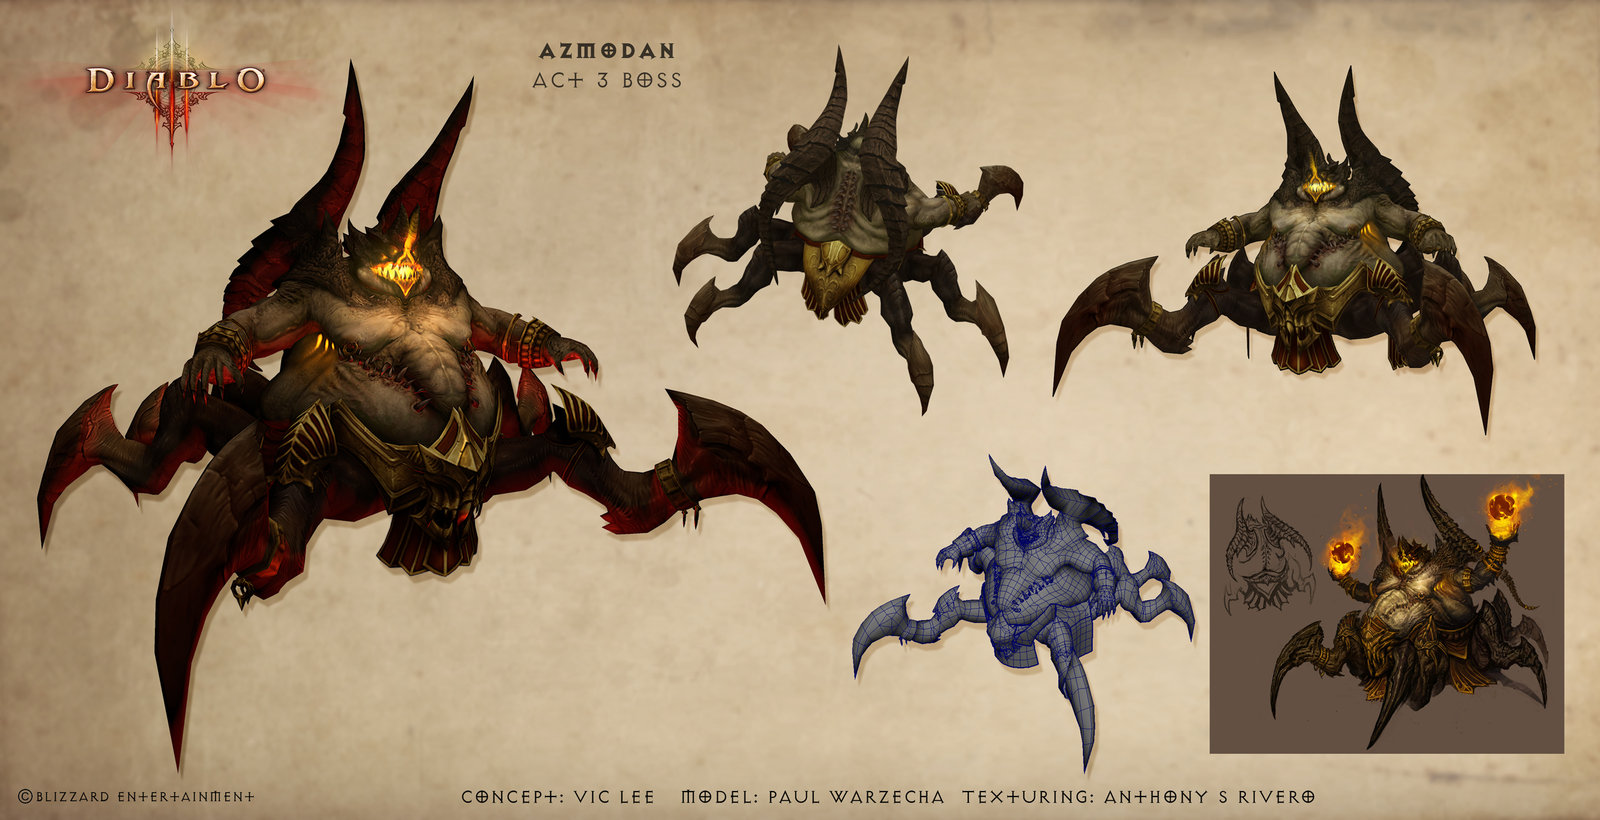 Diablo 3 Azmodan